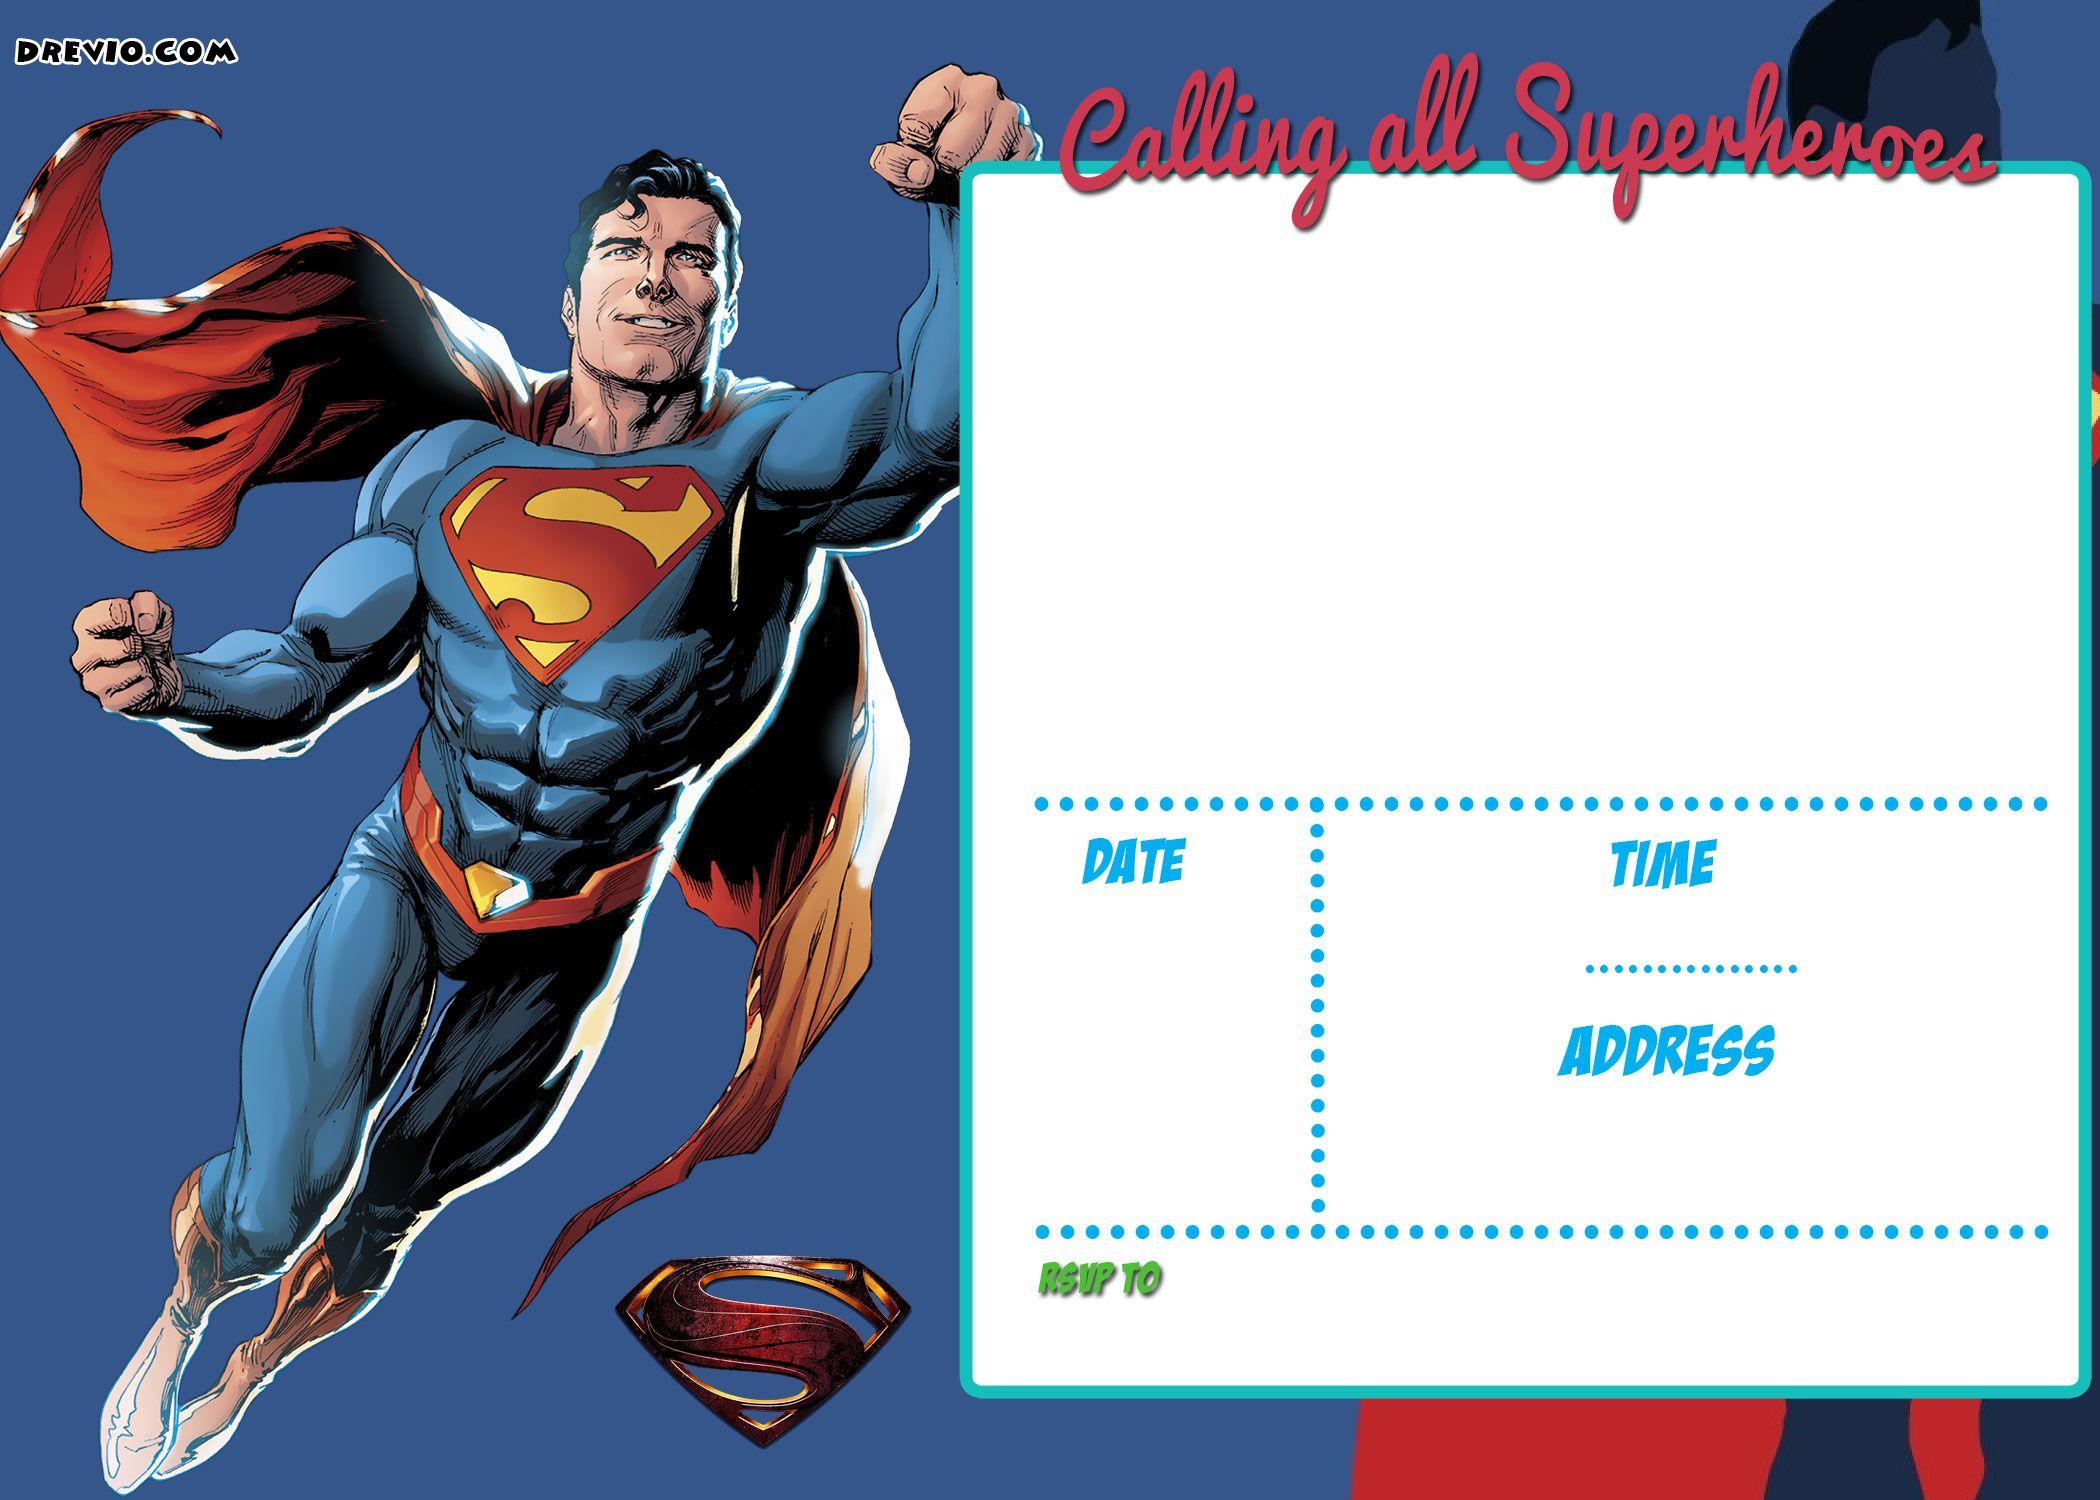 Free Printable Justice League Invitation Template   Free Printable - Free Printable Superman Invitations